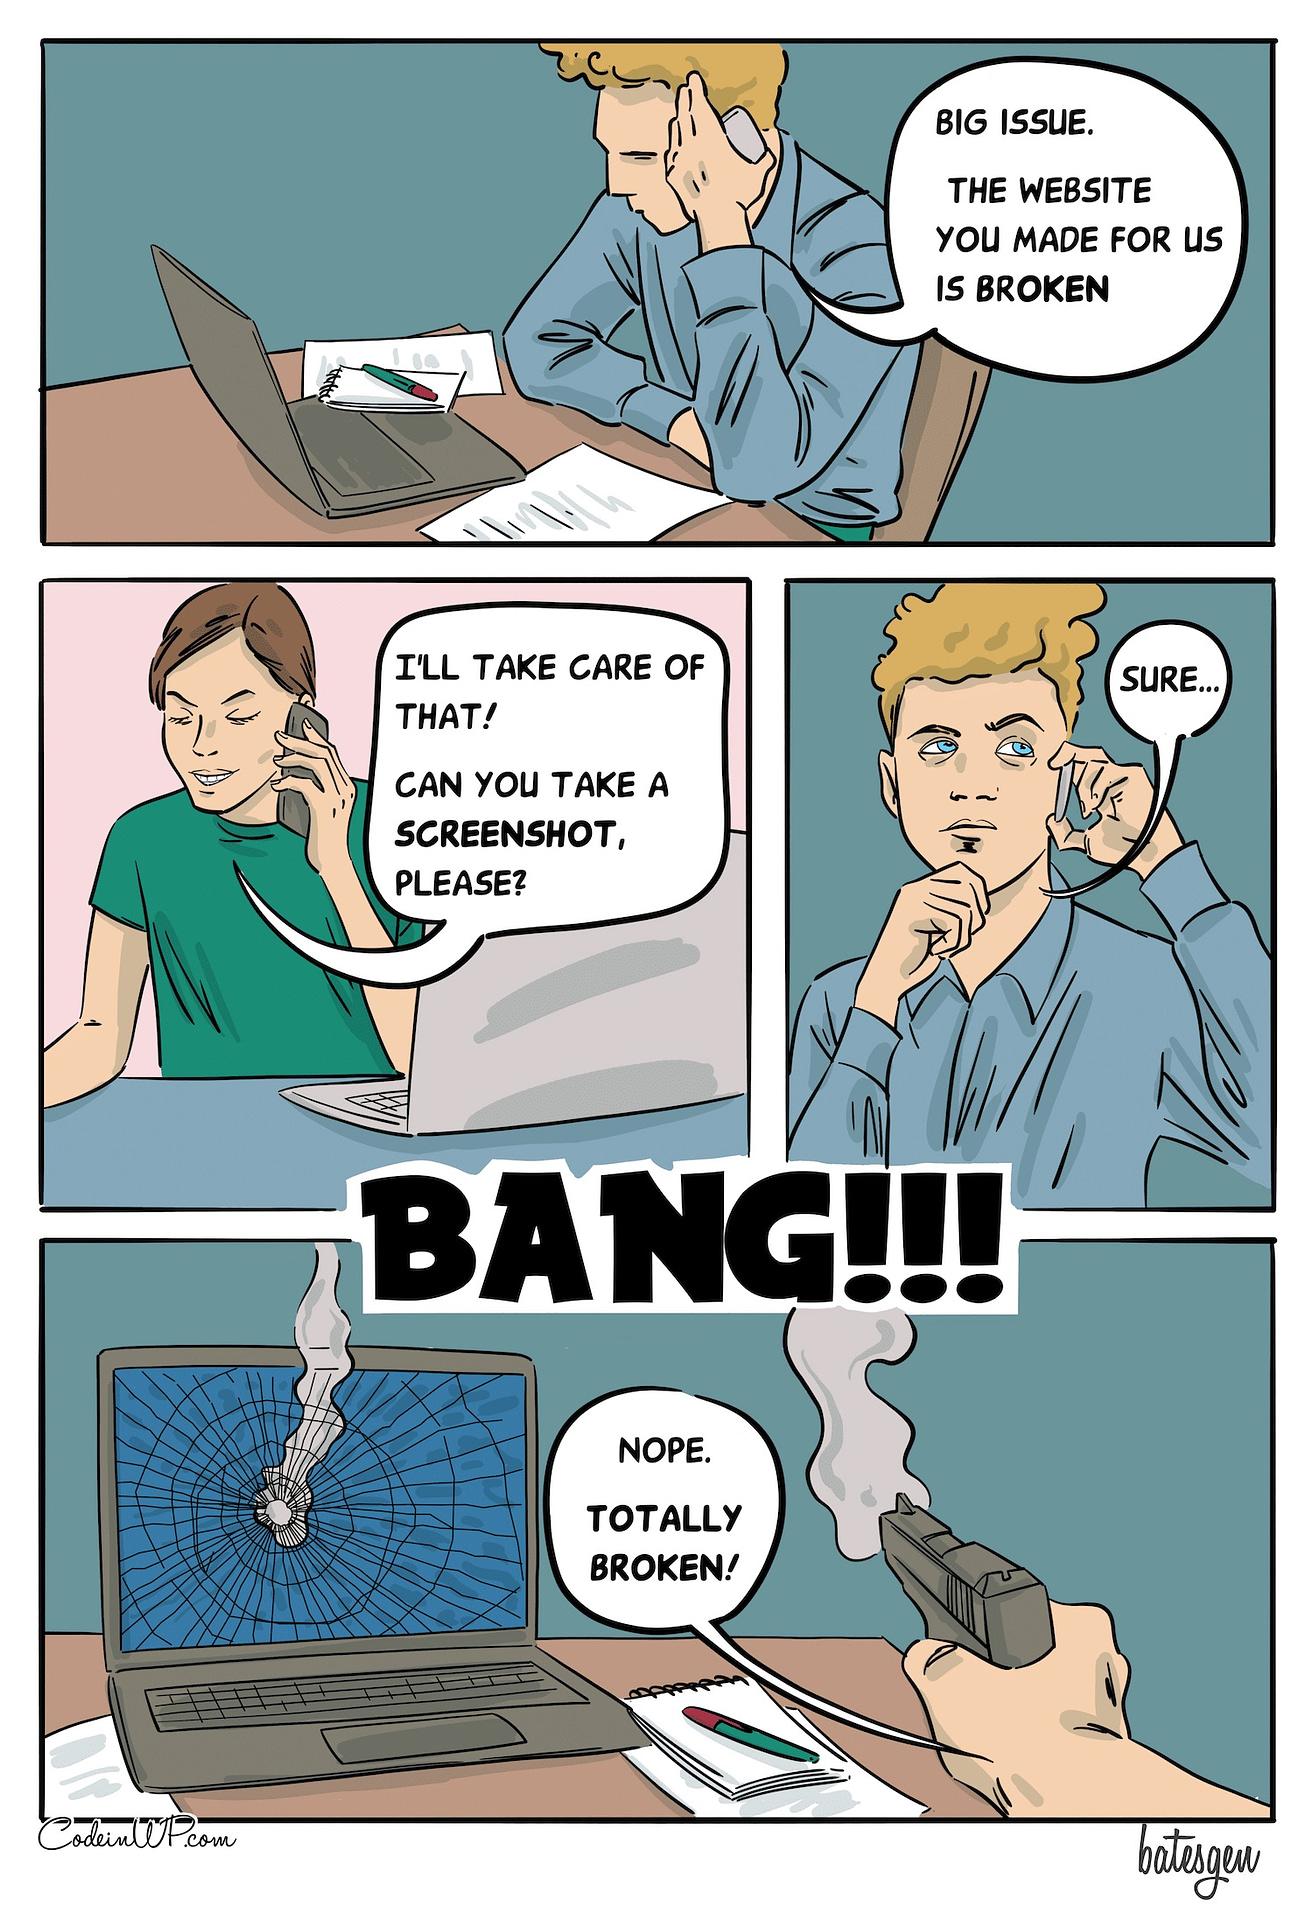 A tech comic about the screenshots and large guns